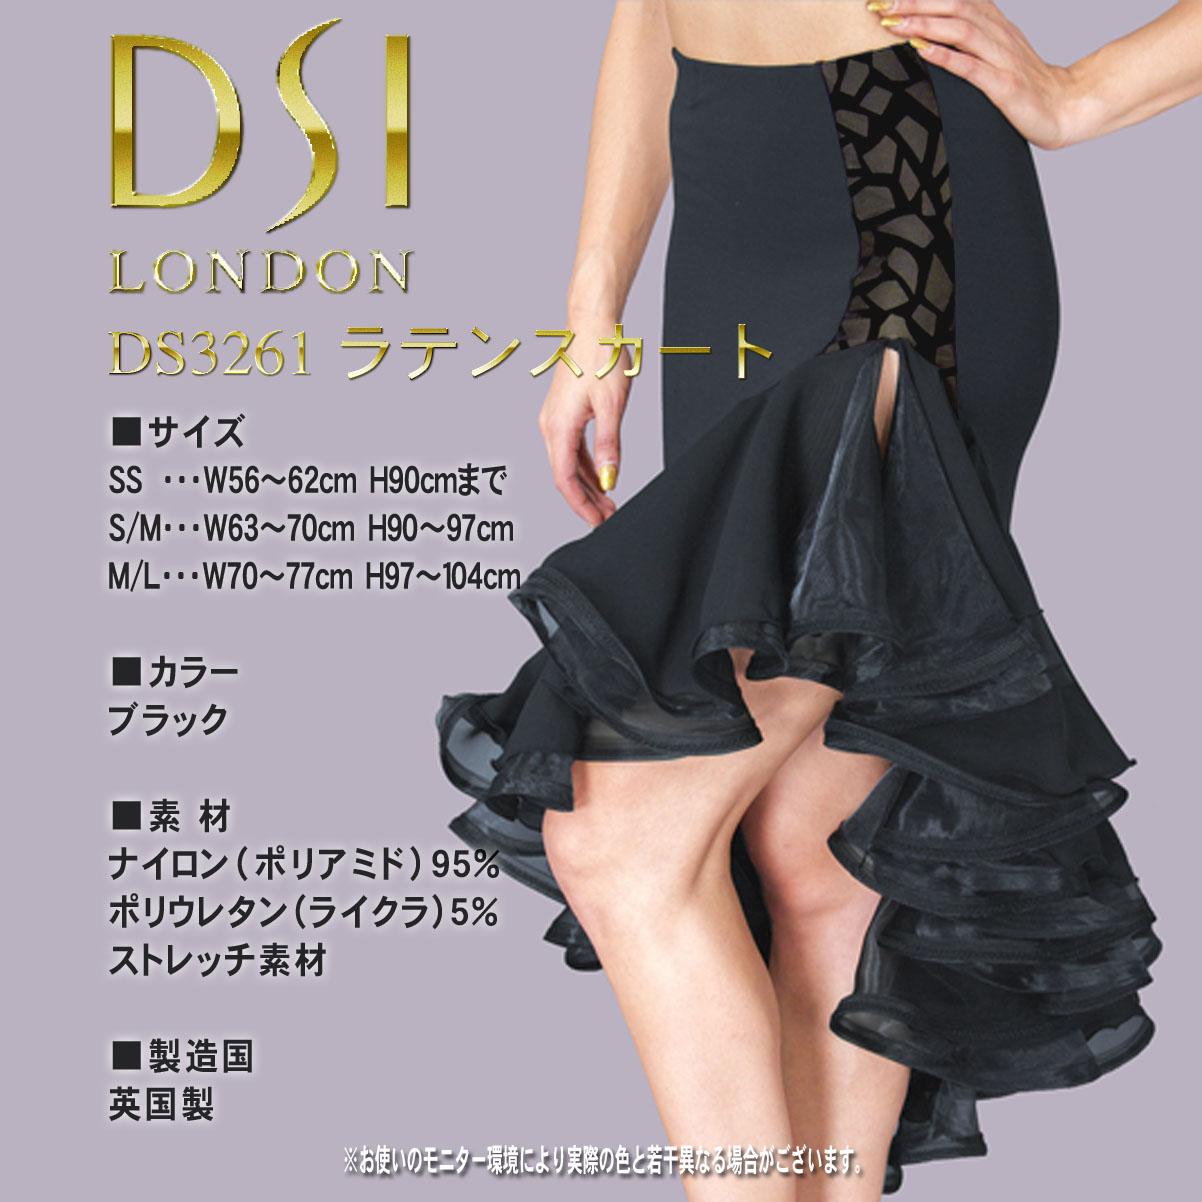 DSI 3261 Julianna skirt